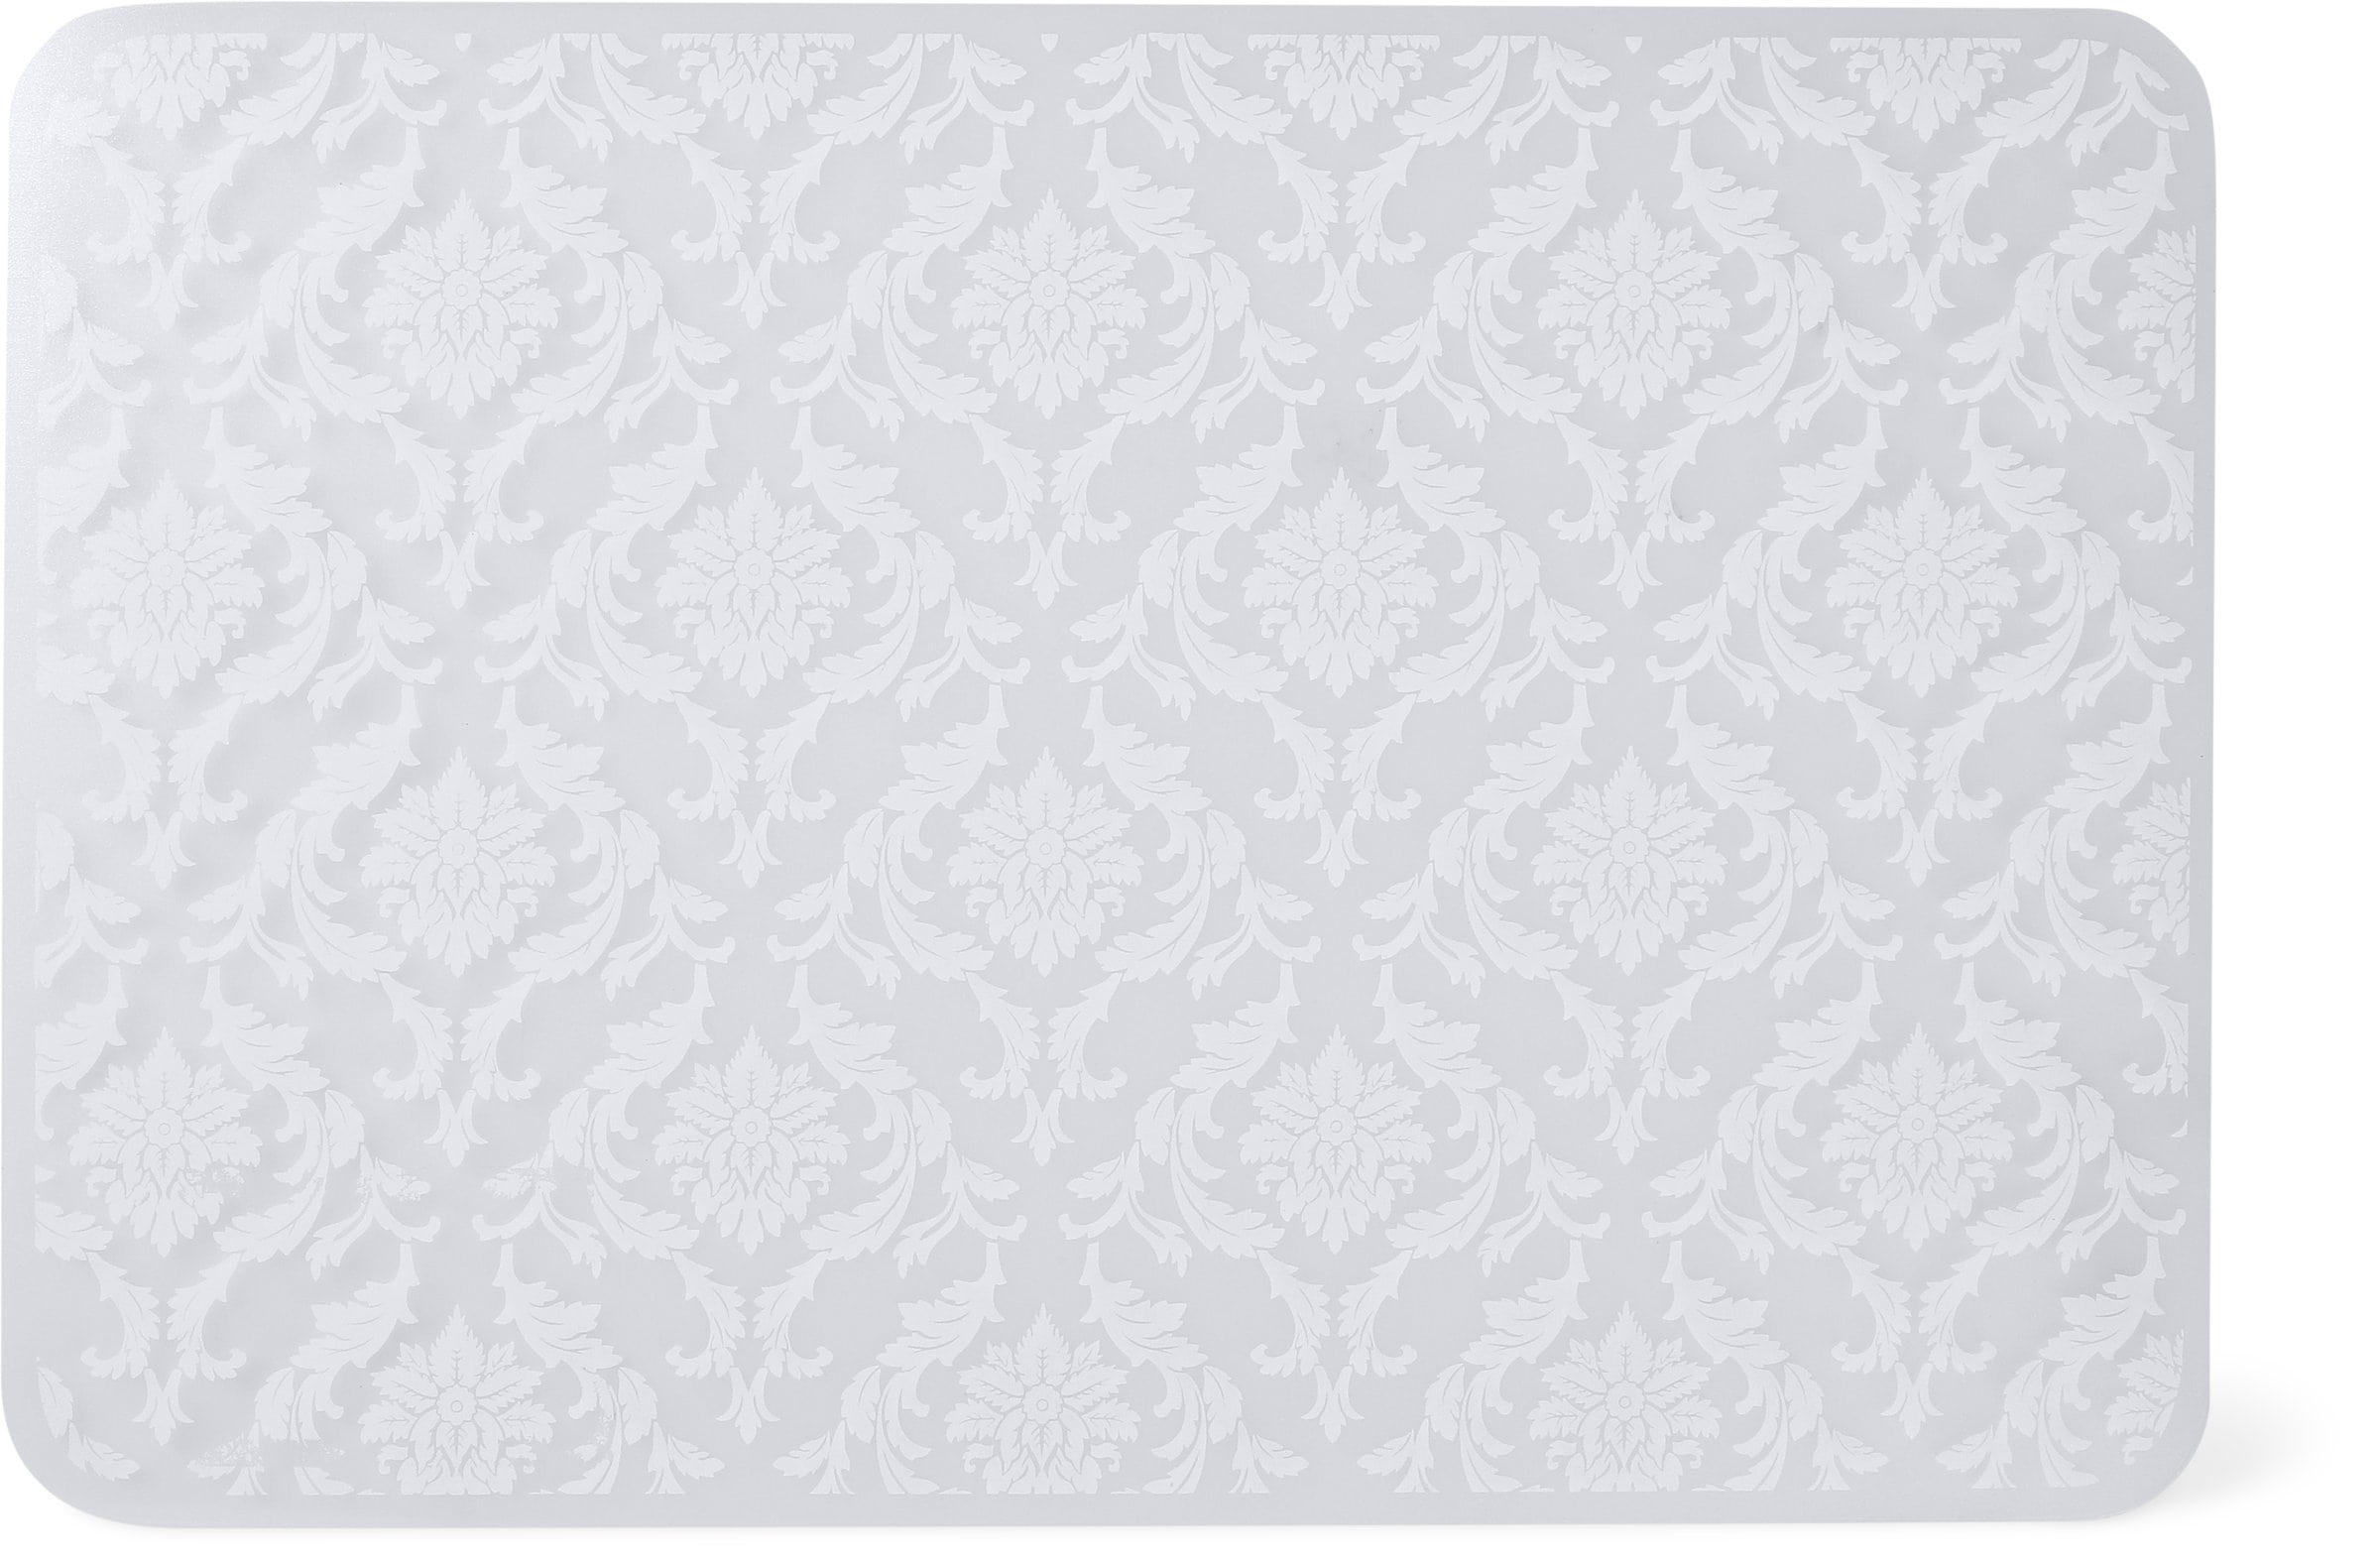 Cucina & Tavola Ornament Set da tavola